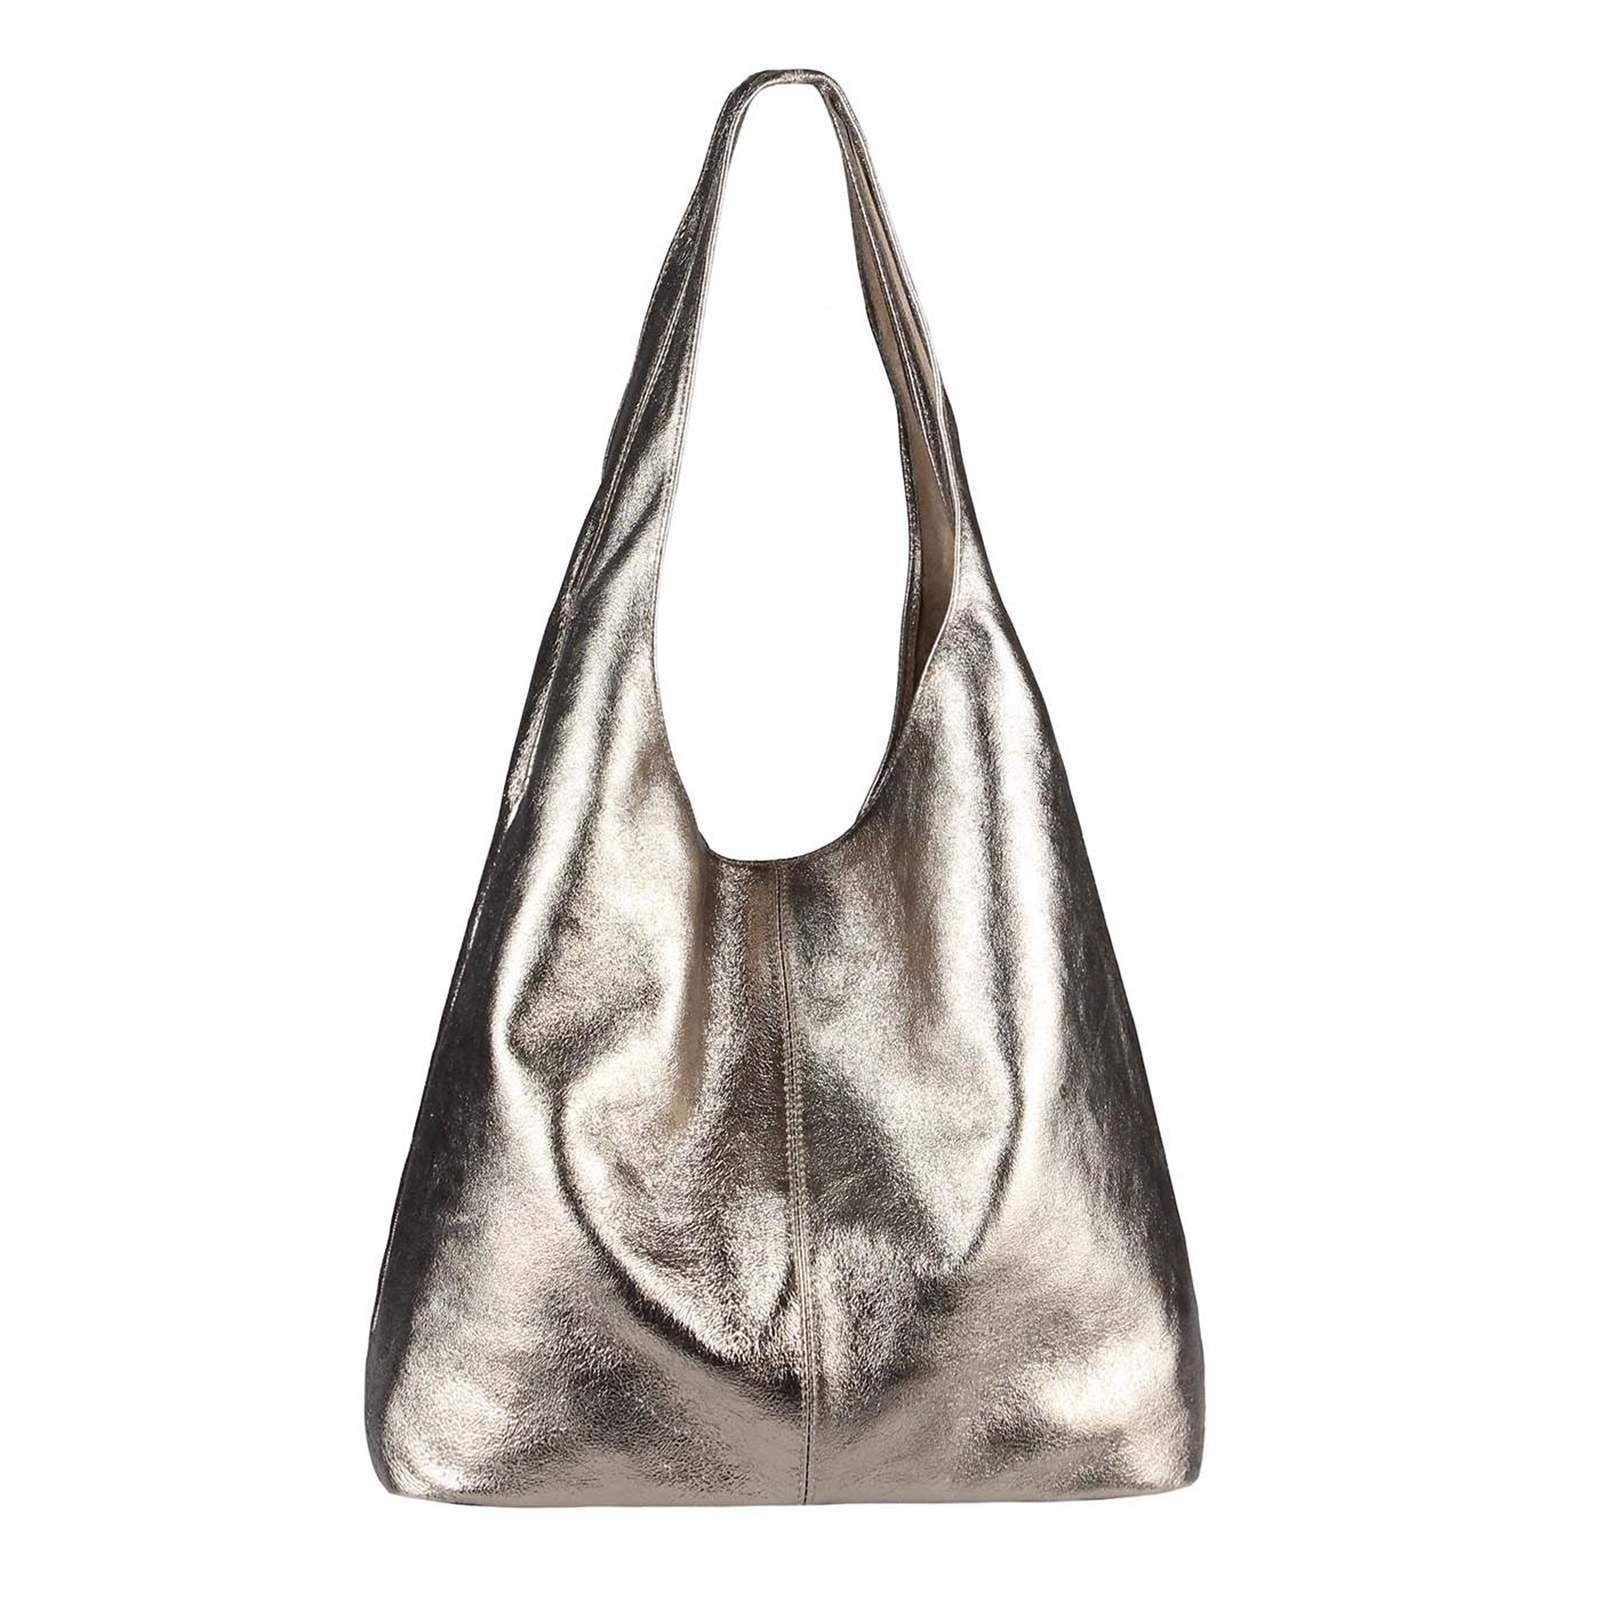 ITALY DAMEN LEDER HANDTASCHE METALLIC Shopper Schultertasche Hobo-Bag vera pelle